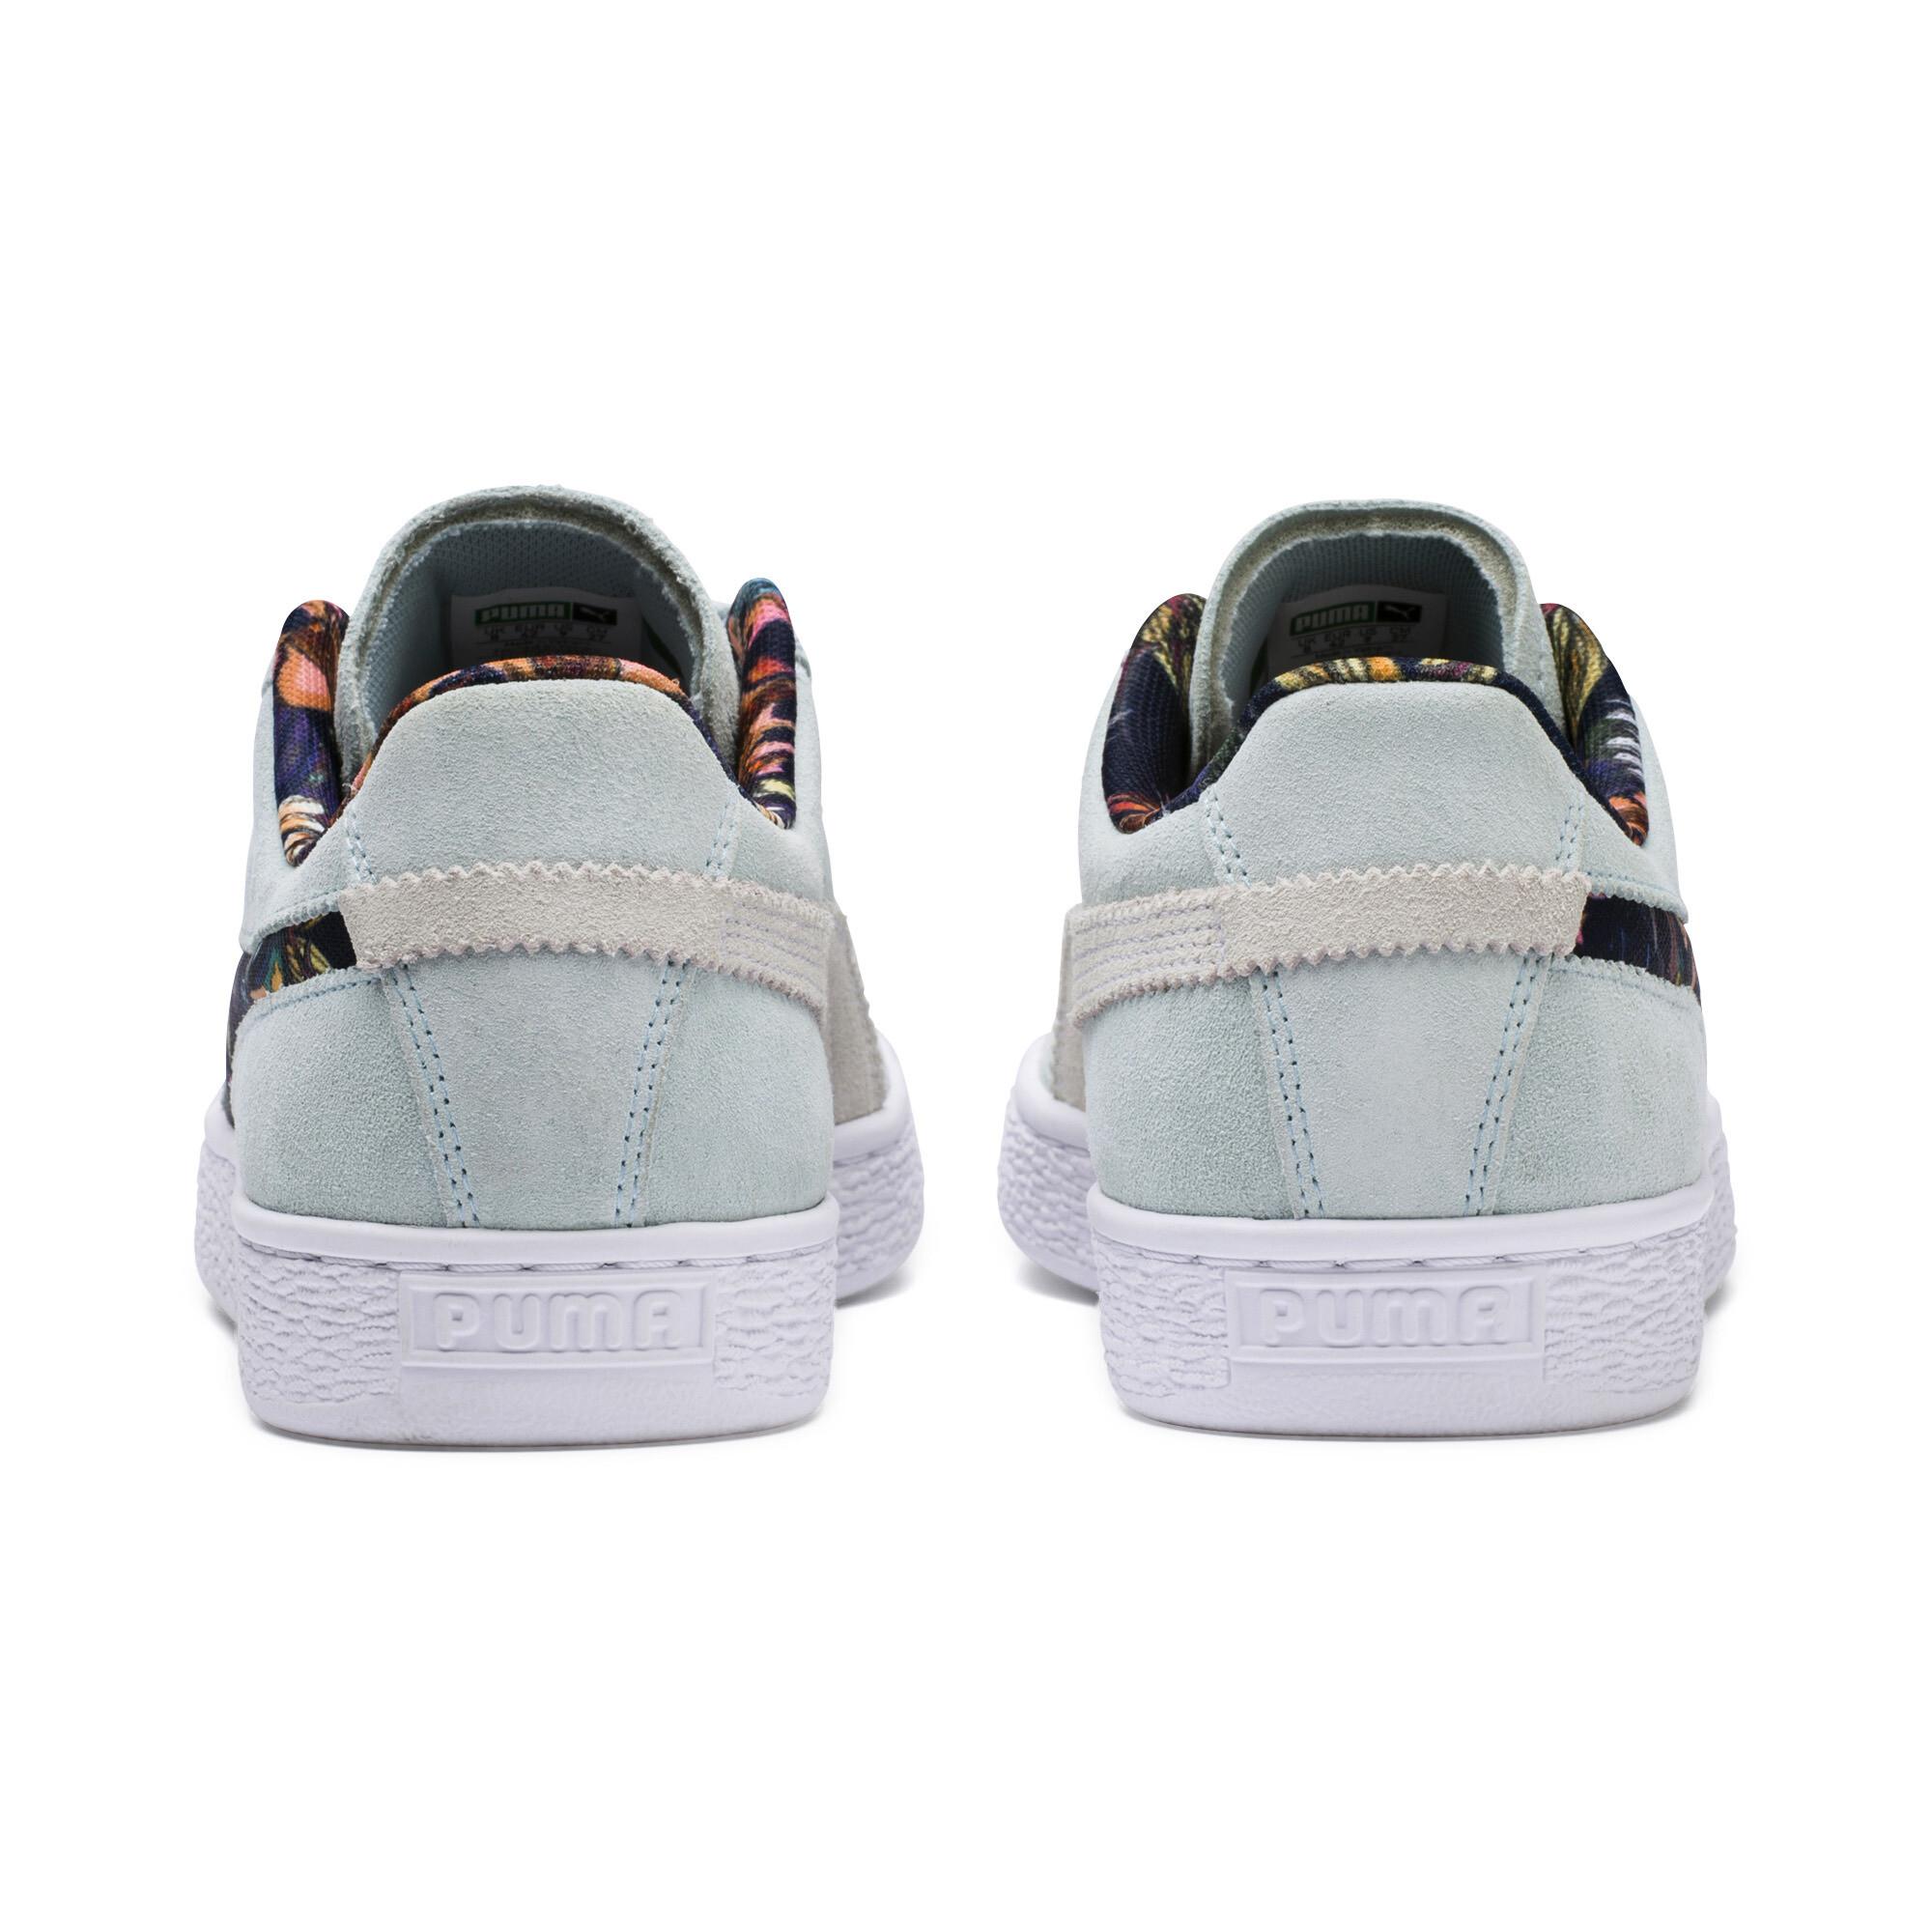 Image Puma Suede Secret Garden Sneakers #4